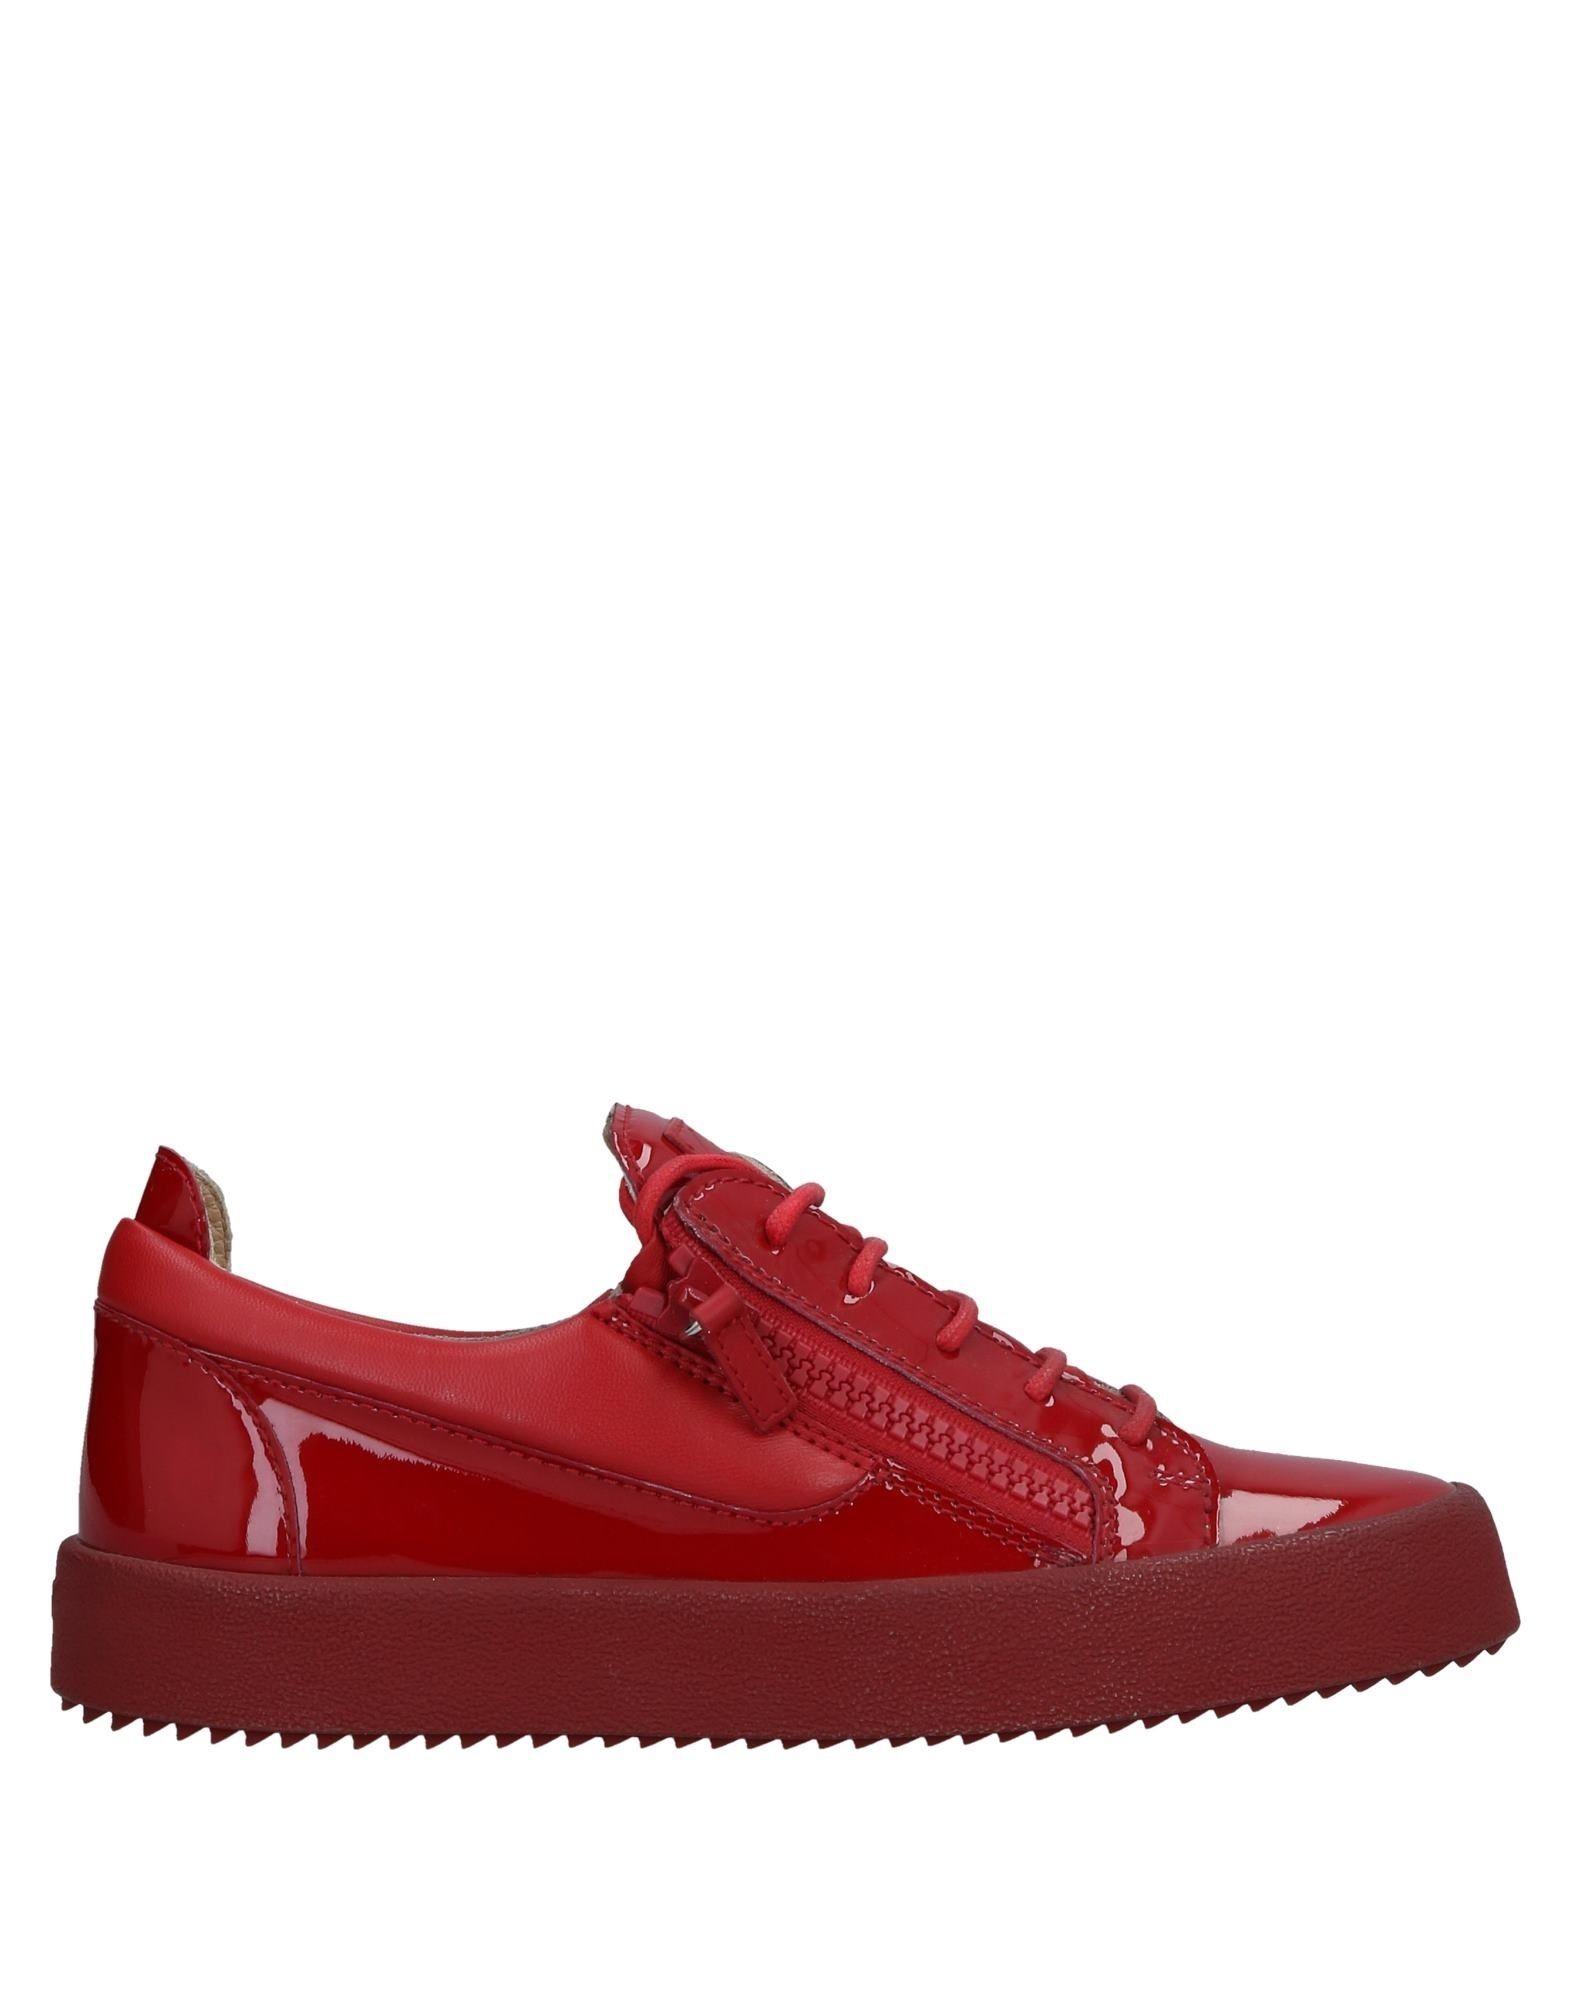 Sneakers Giuseppe Zanotti Homme - Sneakers Giuseppe Zanotti  Rouge Dernières chaussures discount pour hommes et femmes